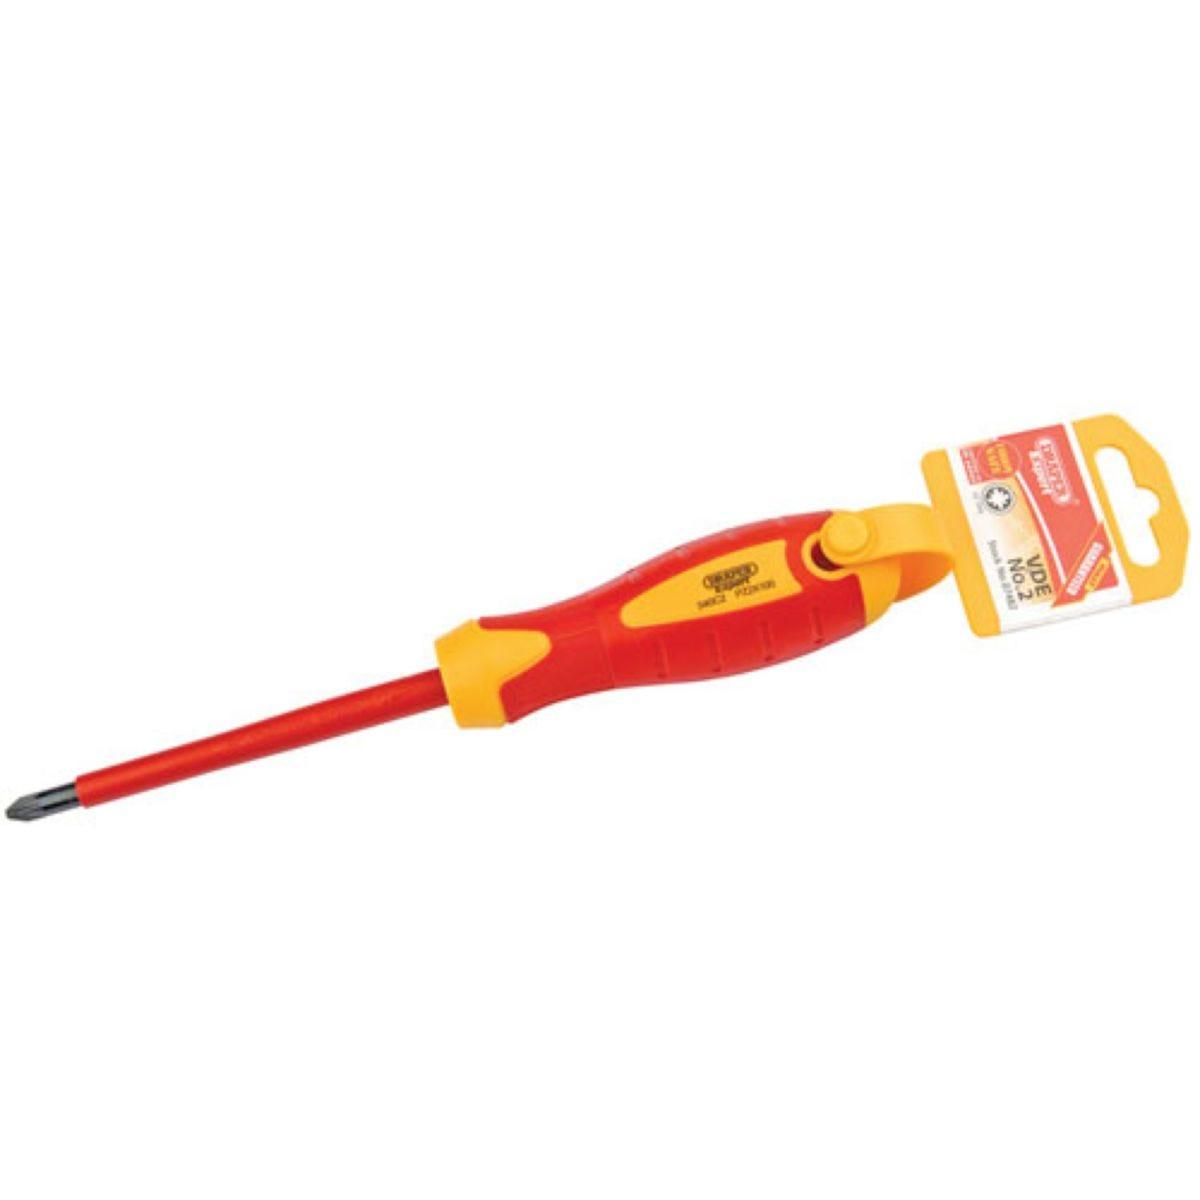 Draper No.2x100mm VDE Soft Grip Screwdriver